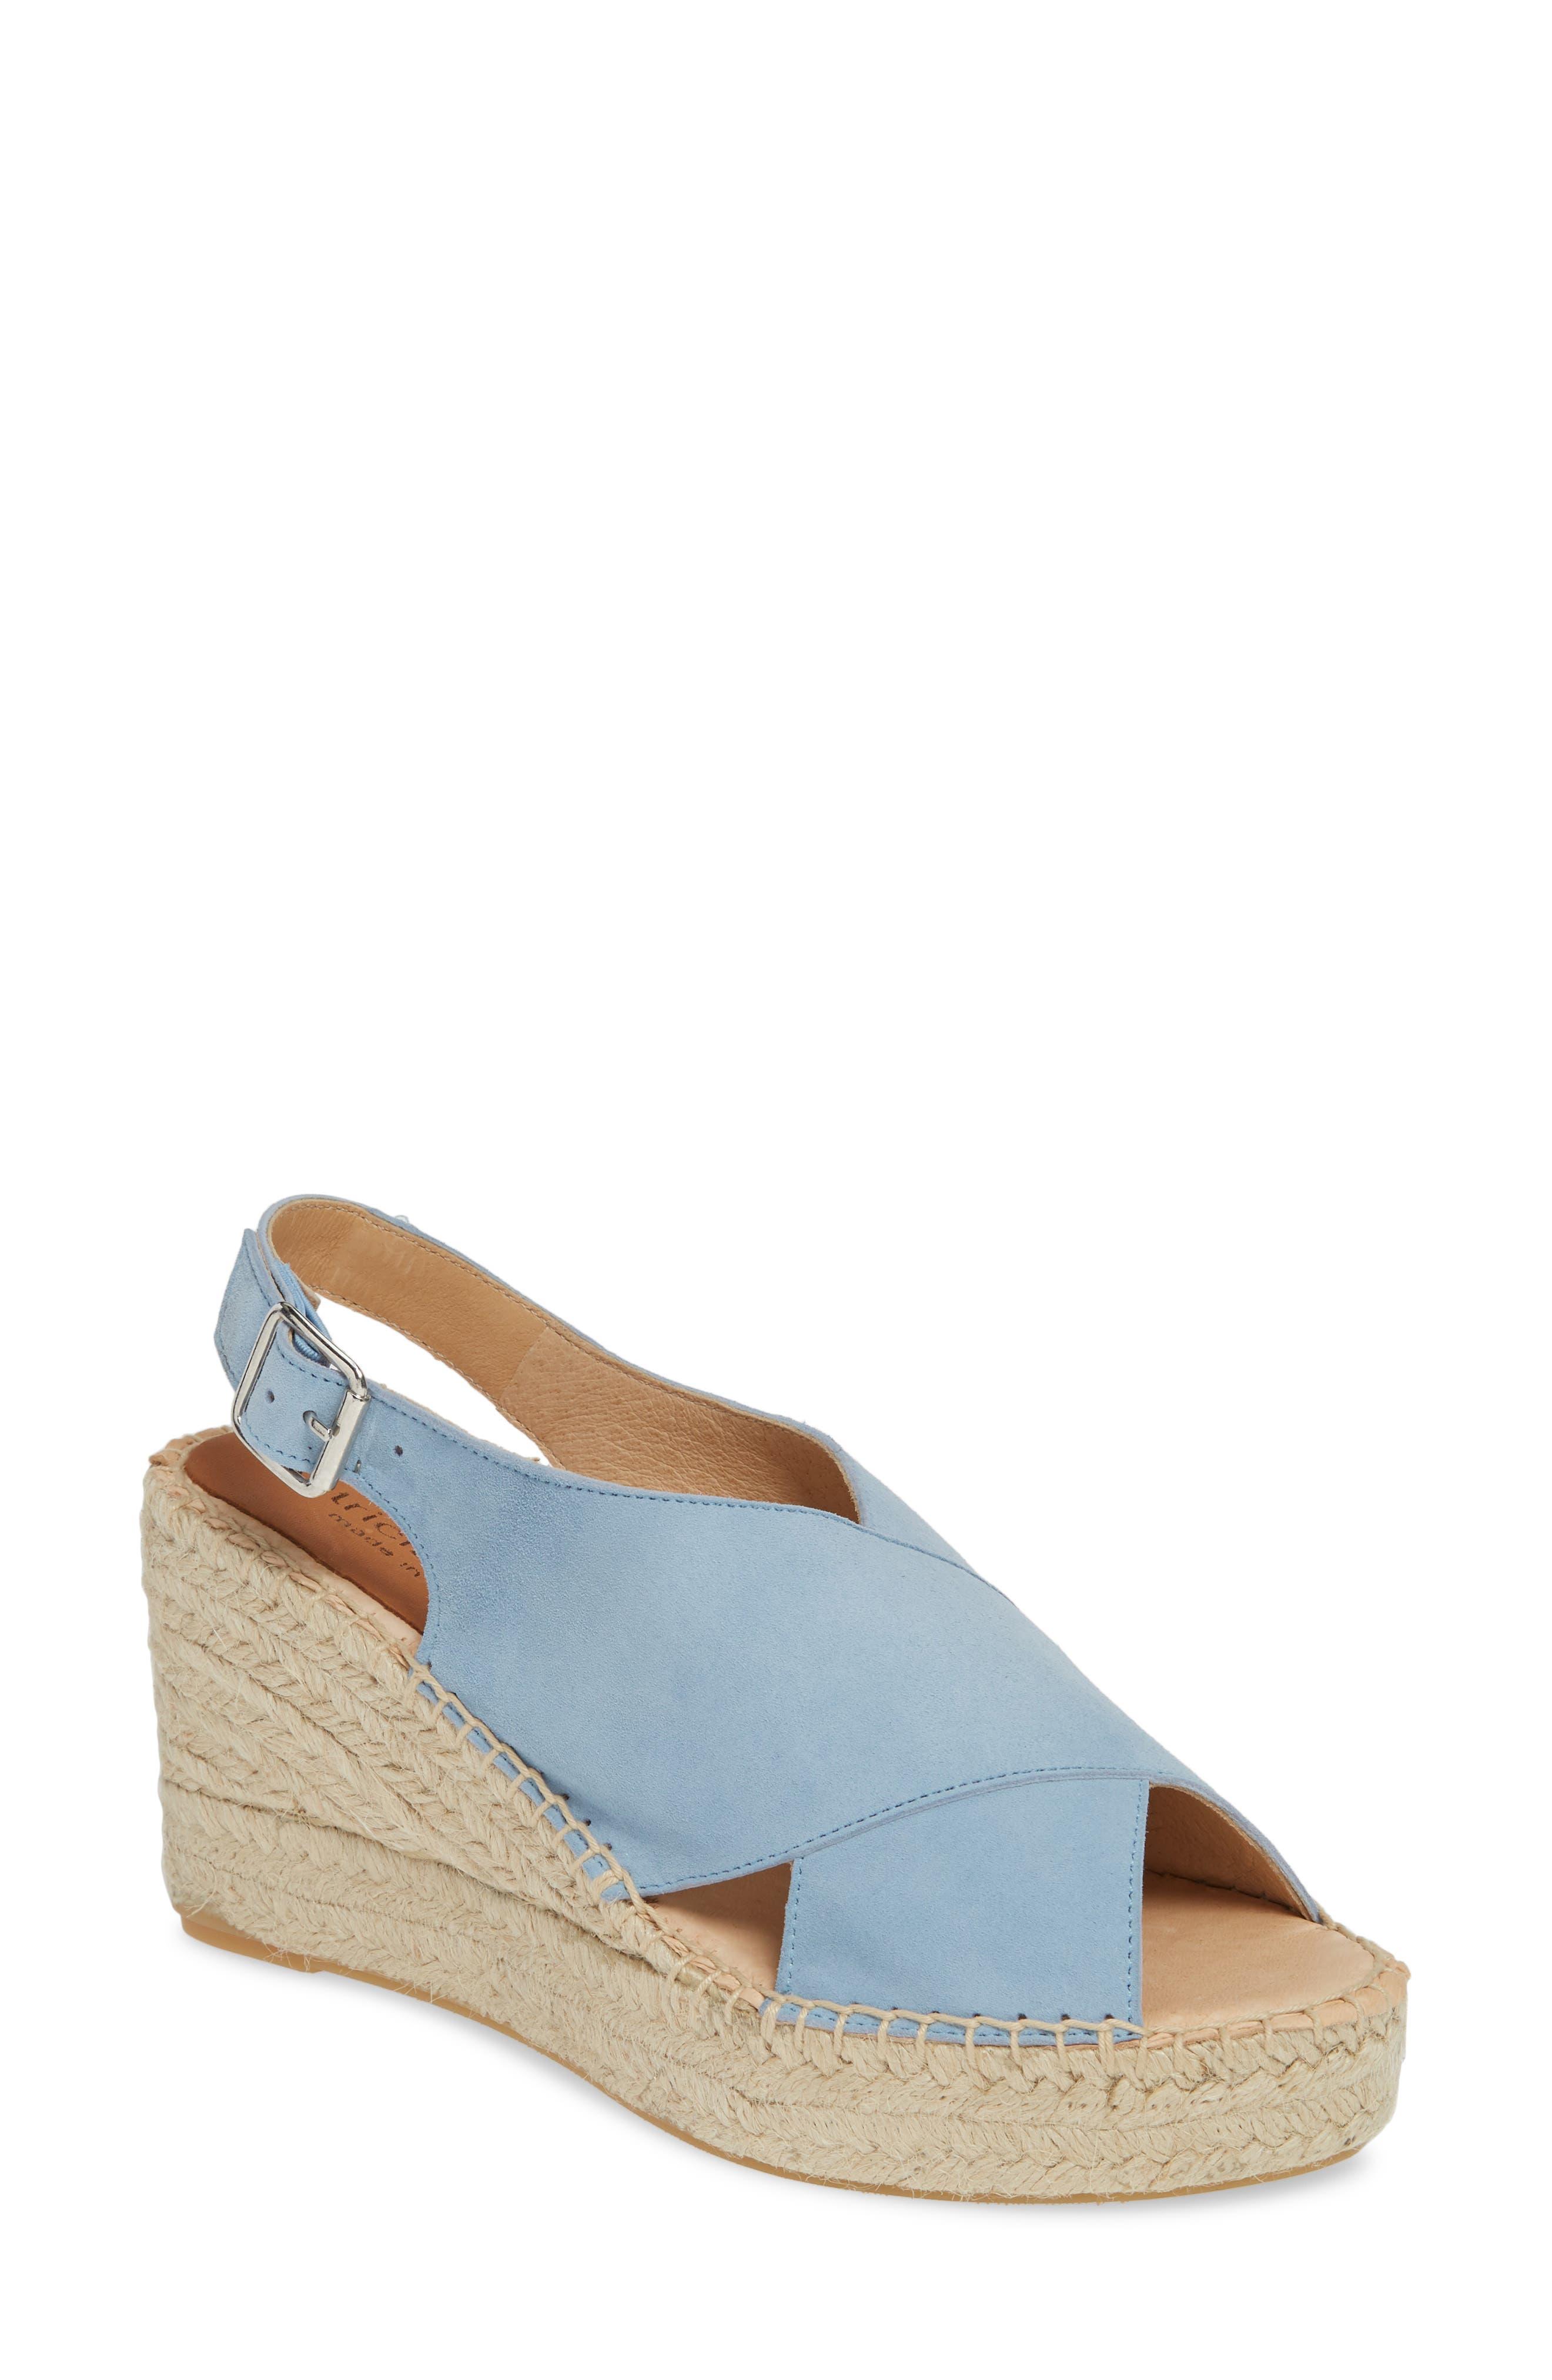 Patricia Green Madeline Espadrille Wedge Sandal, Blue